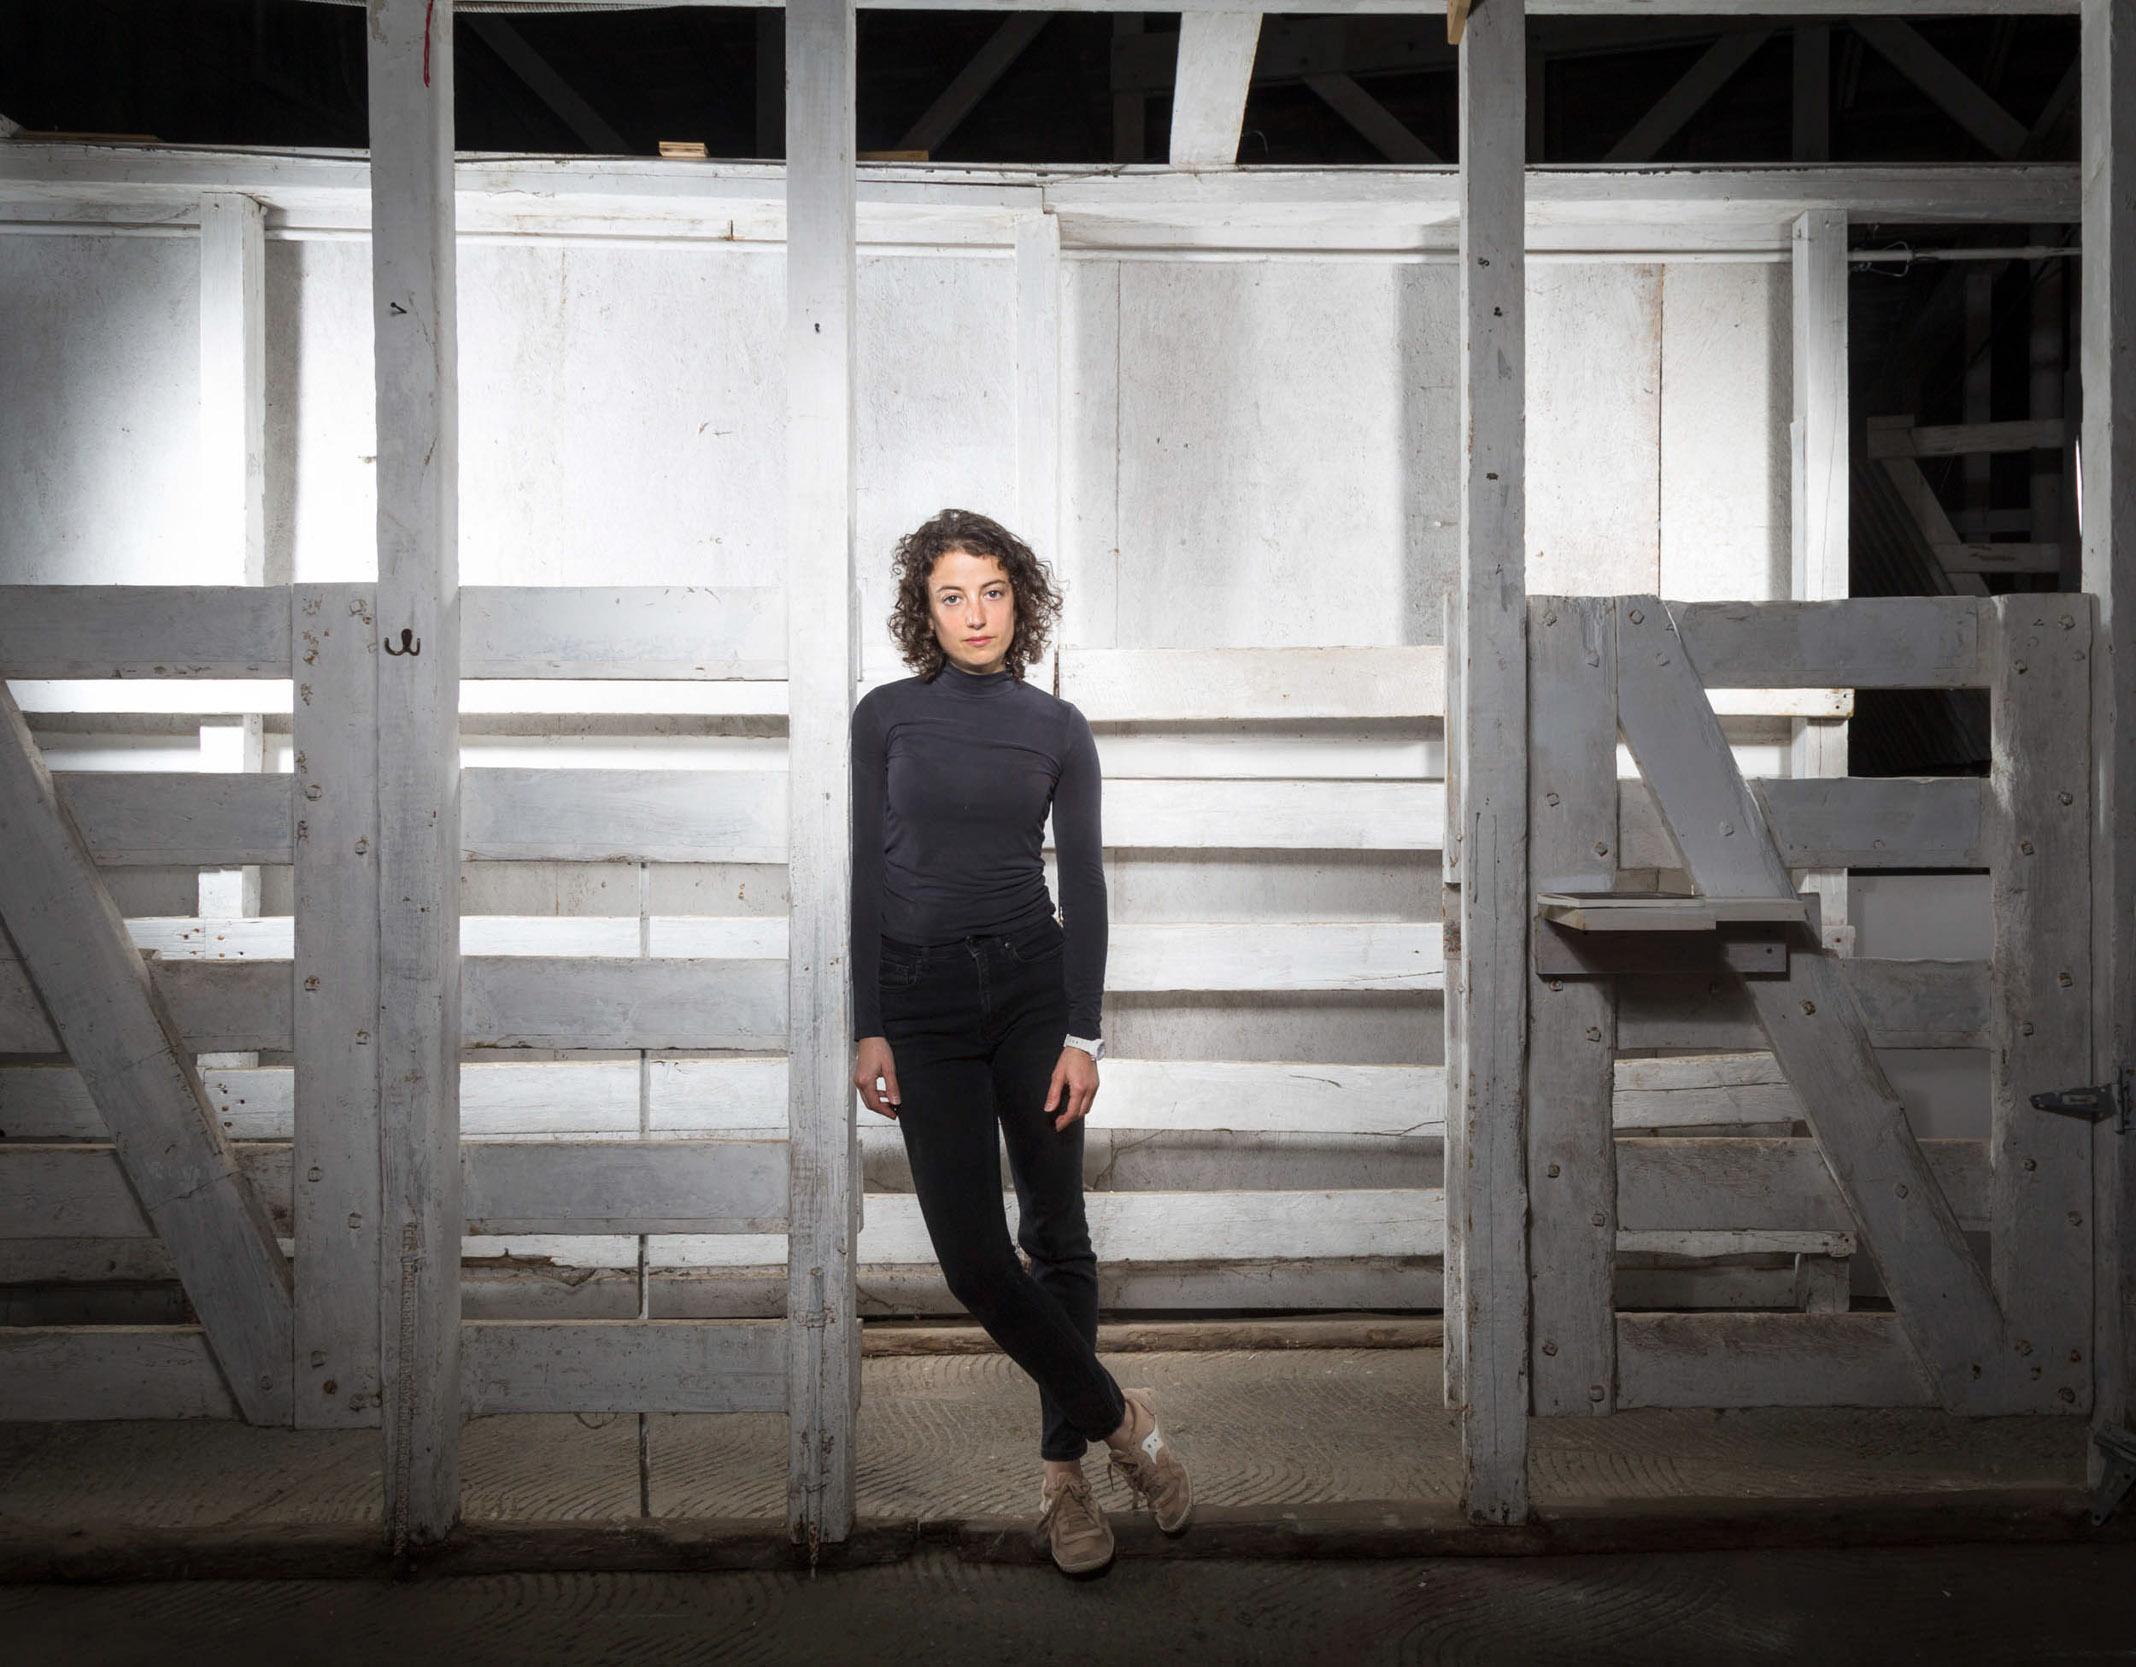 SUSAN KLEIN - Artist-in-Residence